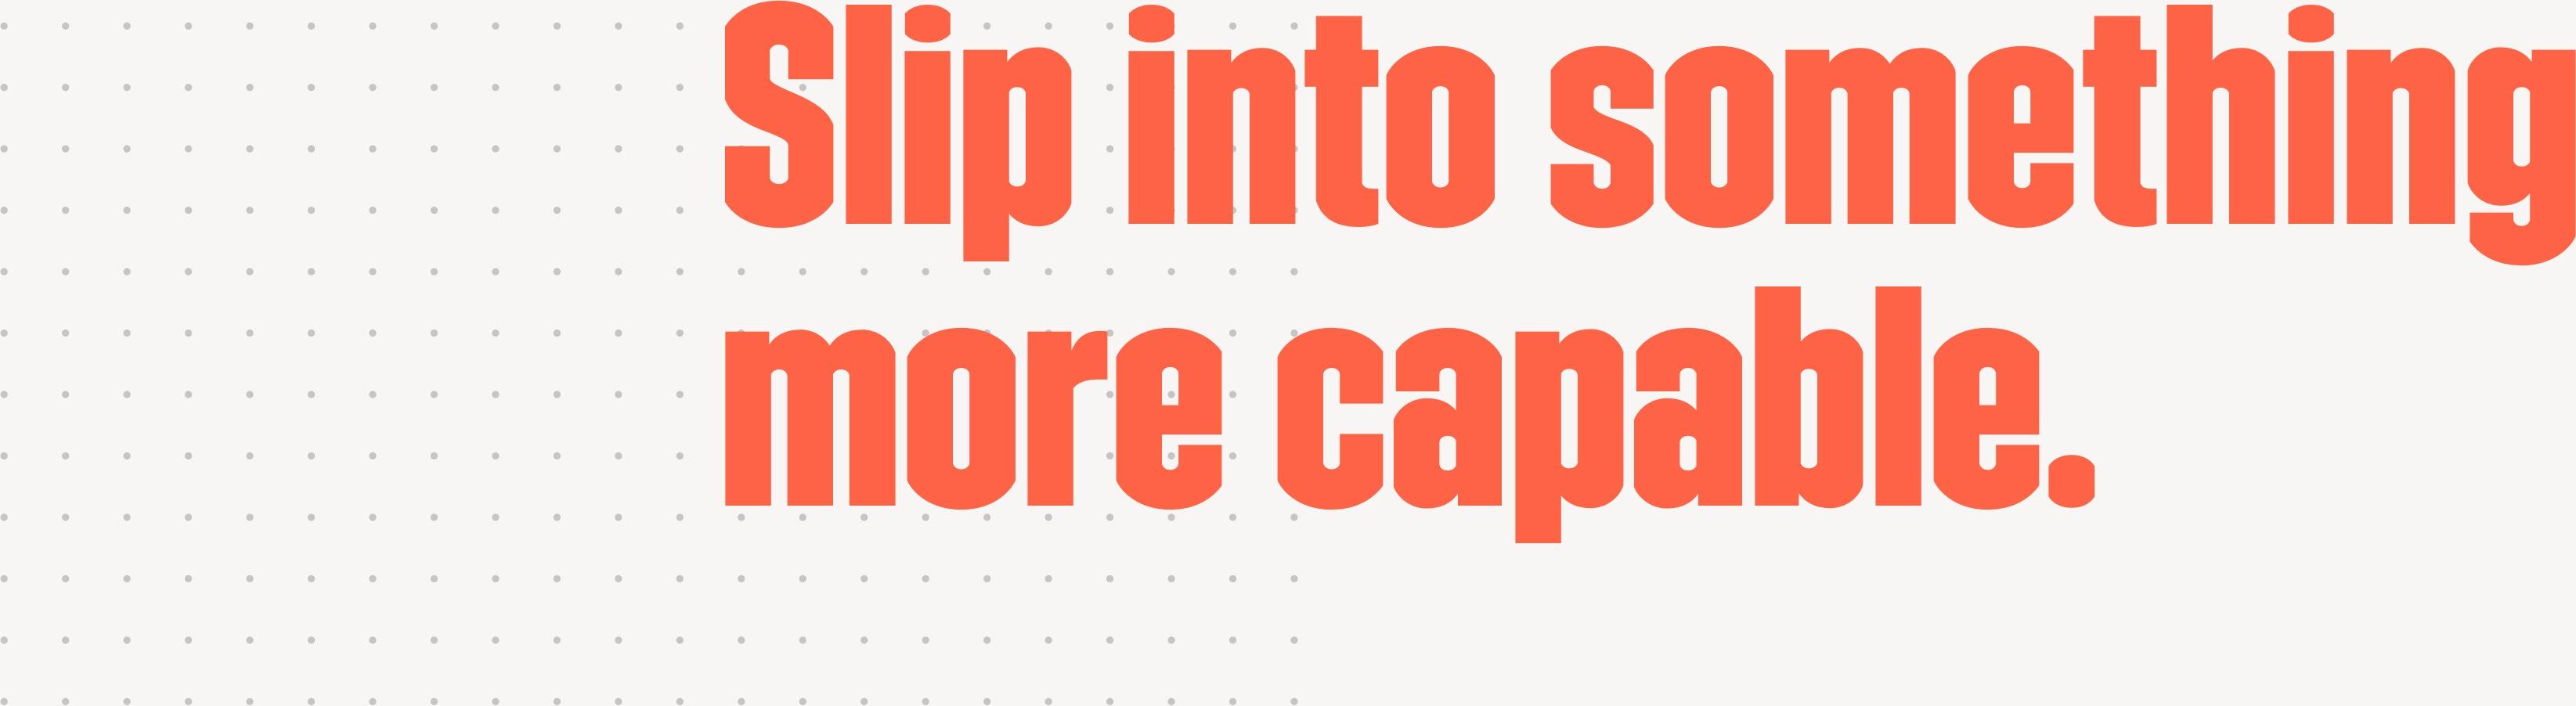 Image of headline saying Slip into something more capable.